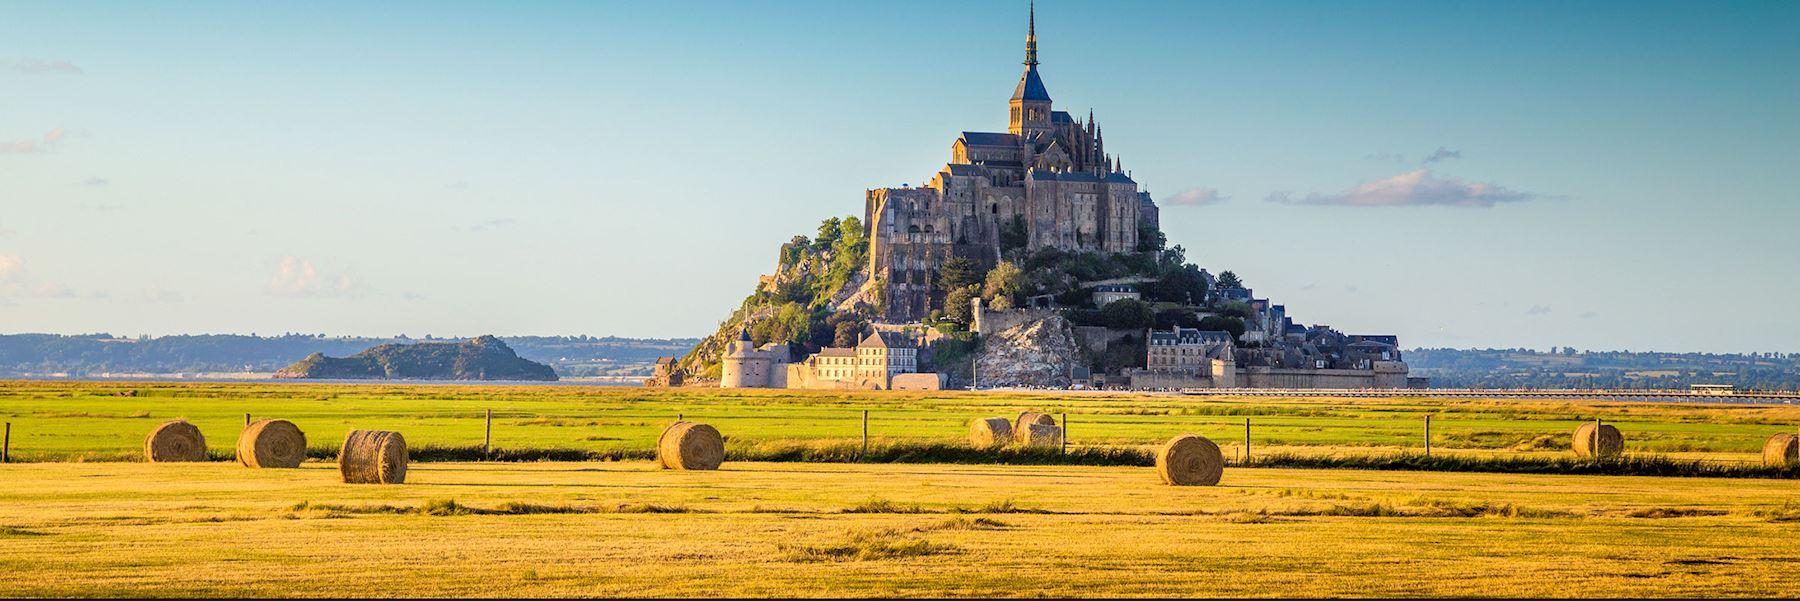 Tailor made vacations to mont saint michel audley travel for Au jardin st michel pontorson france